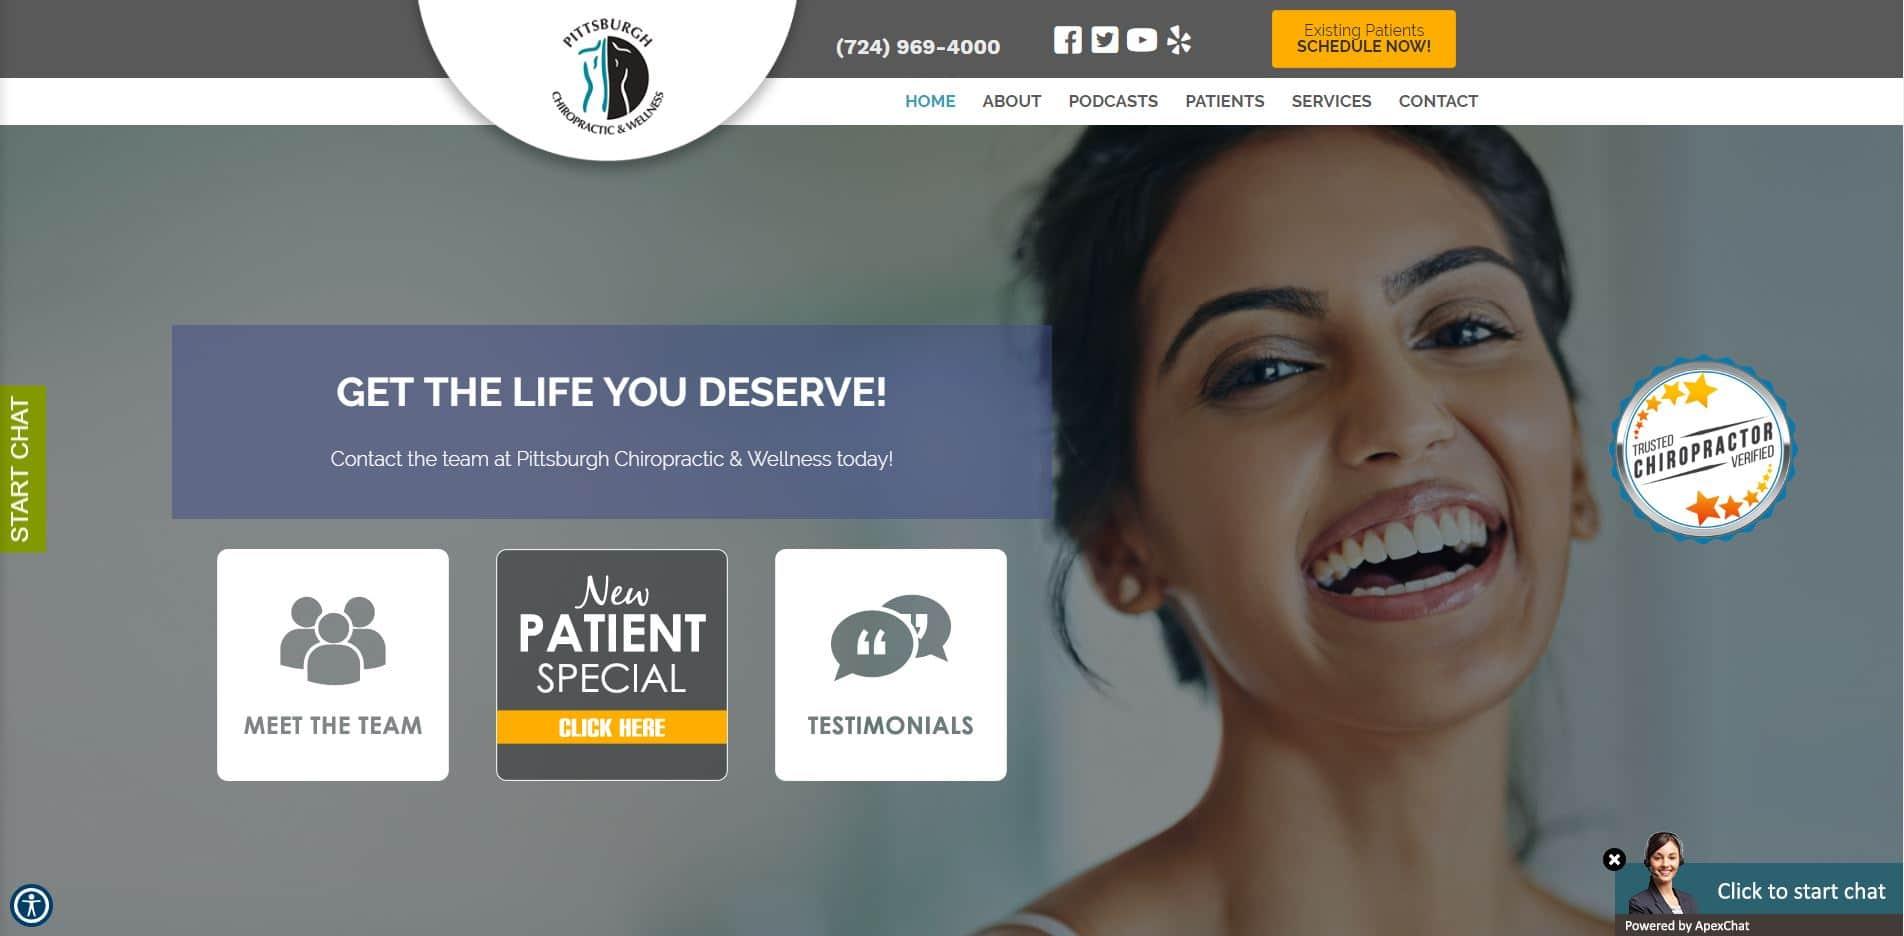 Chiropractor in Canonsburg